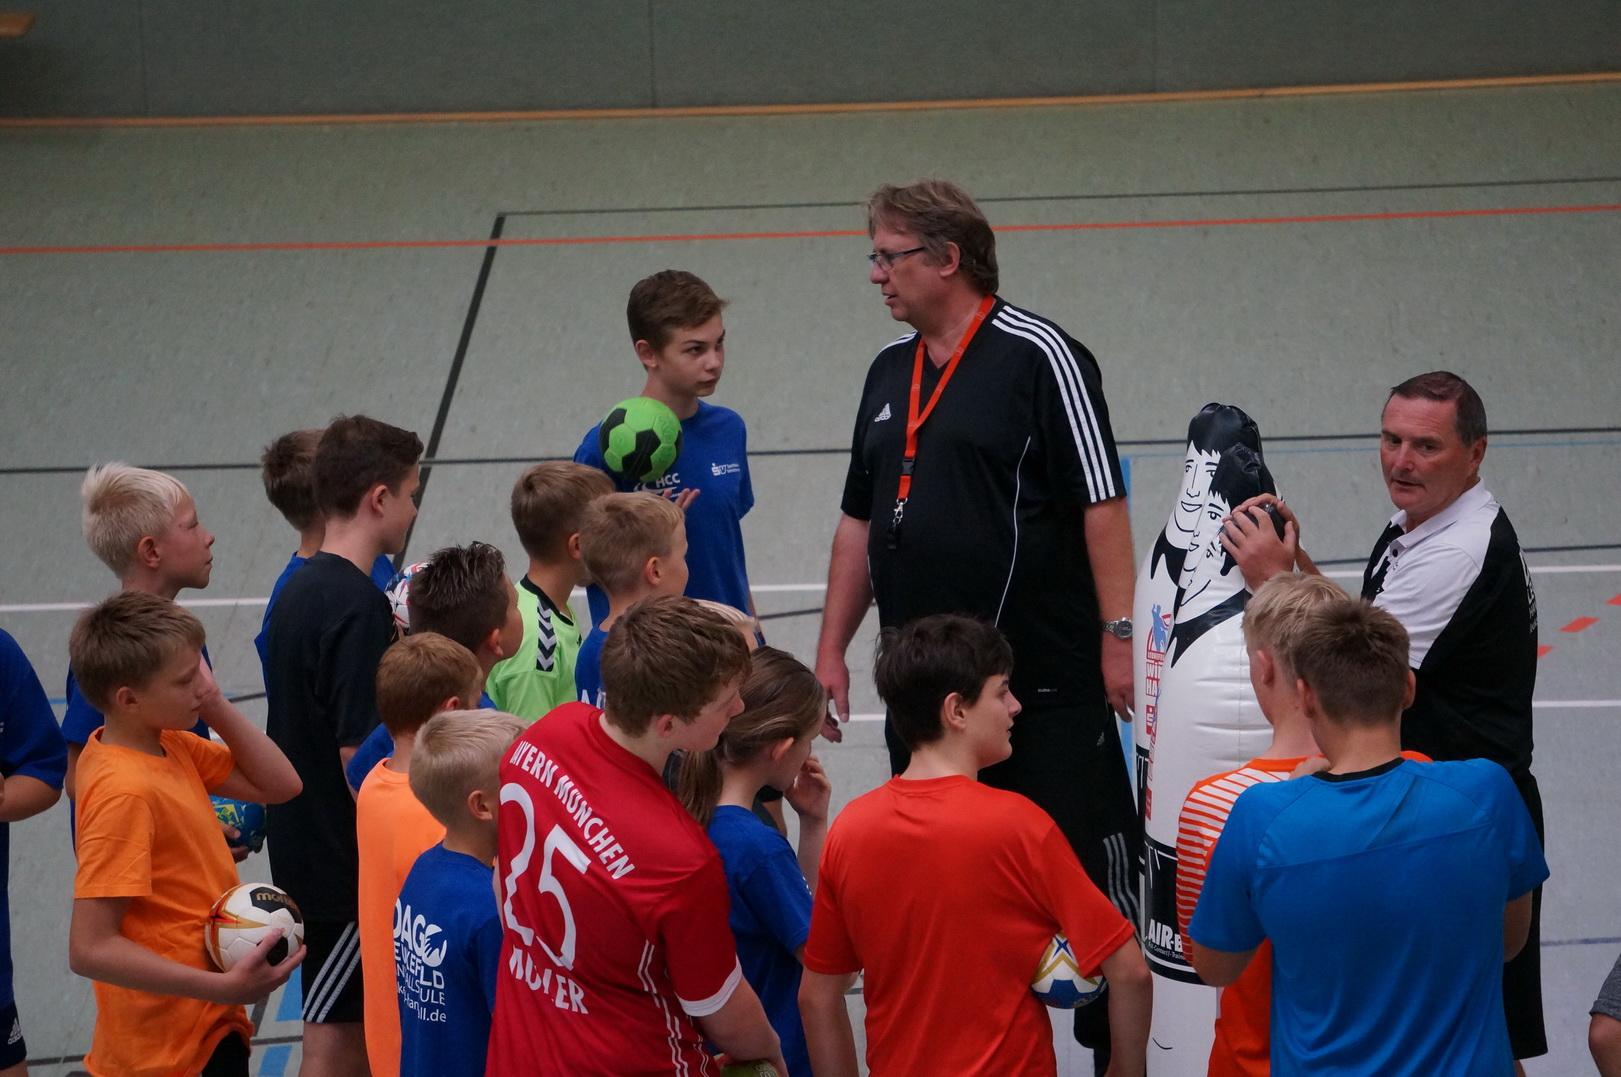 201808_Handballcamp_SDH_MG_246w